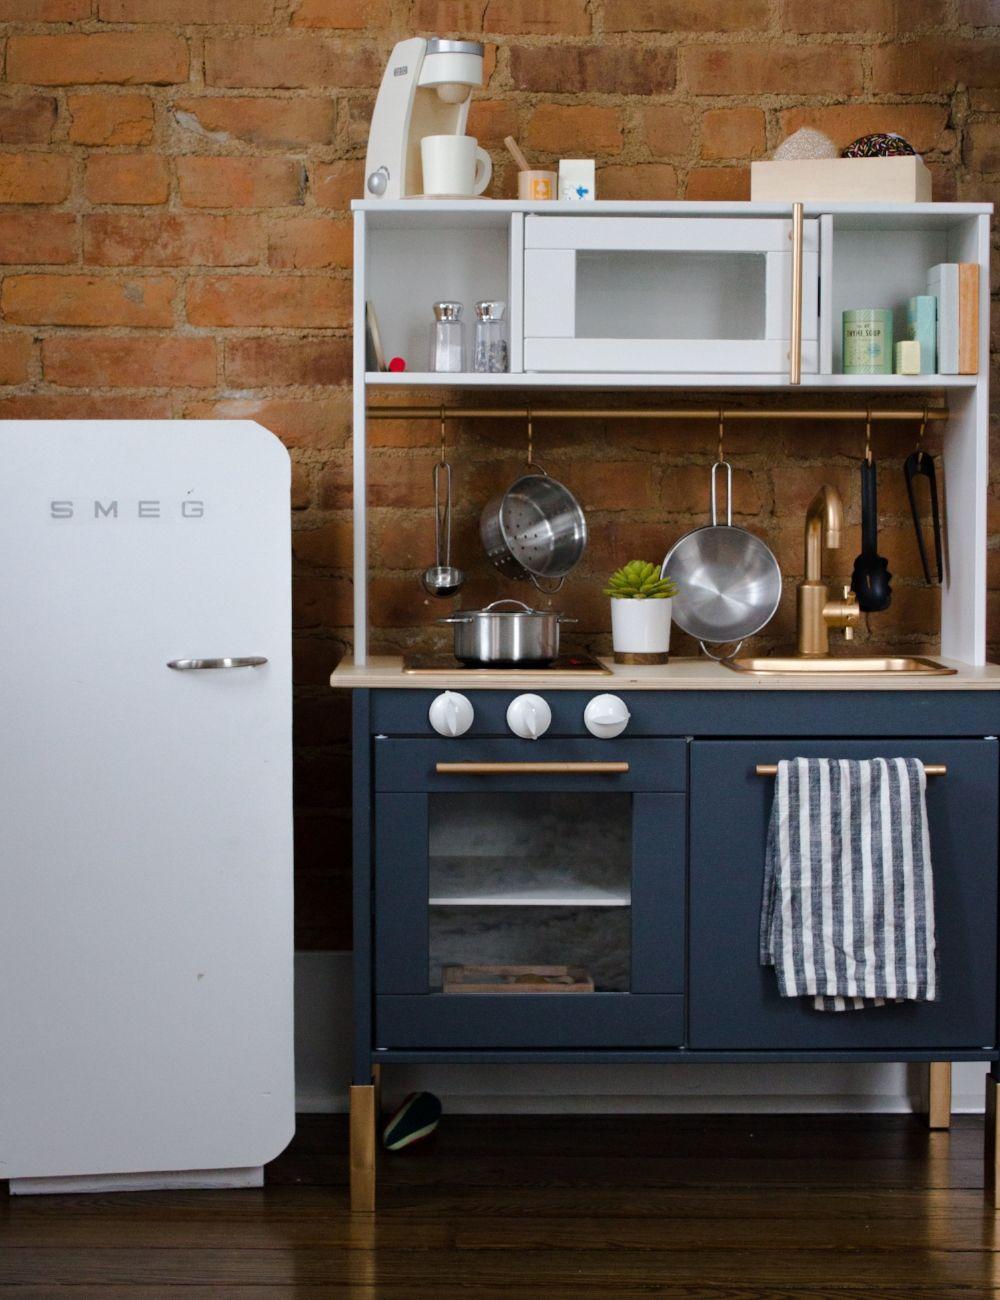 ikea play kitchen hack lastenhuone 2018 pinterest. Black Bedroom Furniture Sets. Home Design Ideas